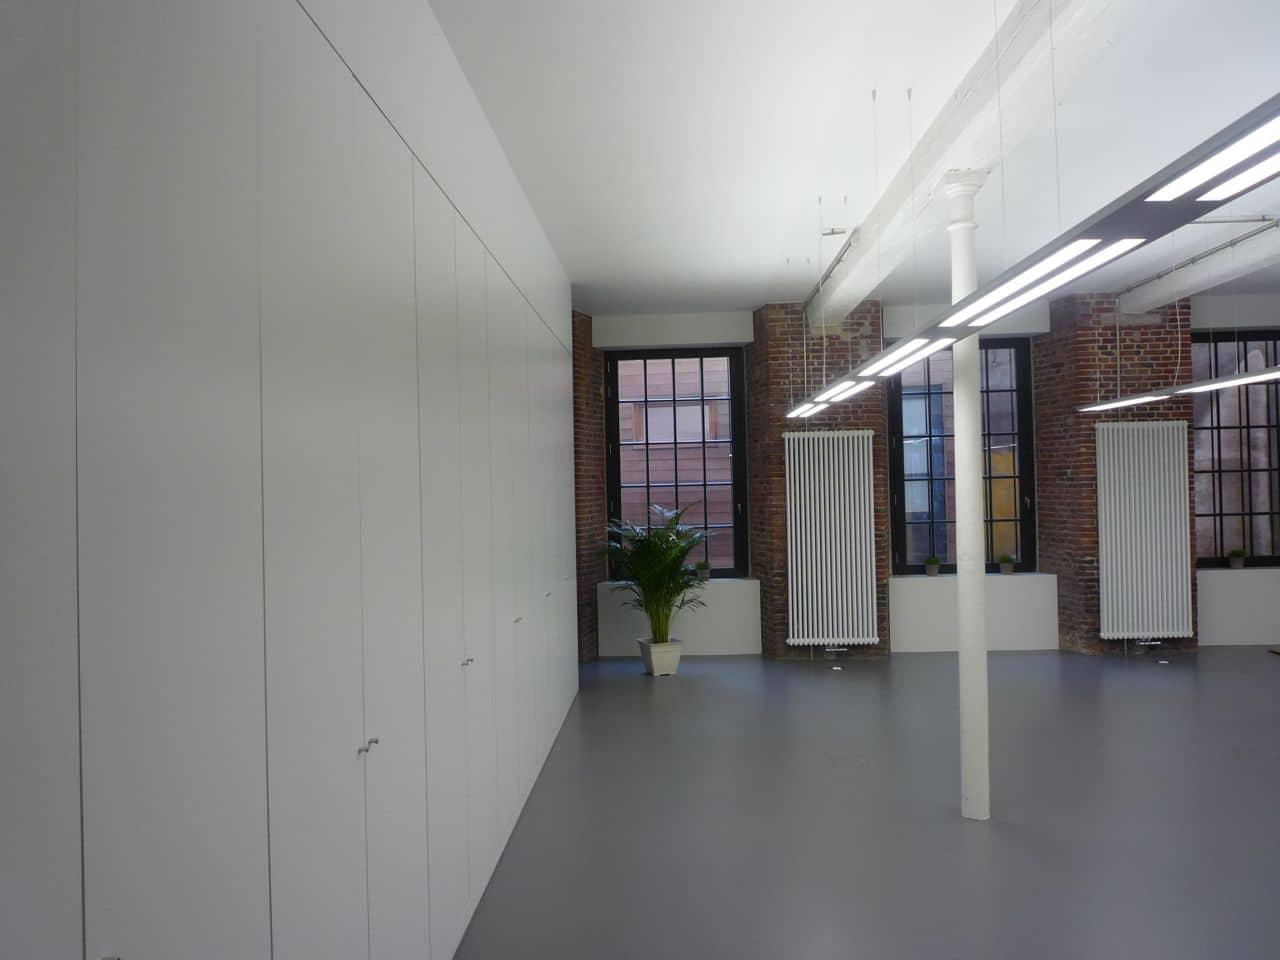 P1060696 | Baeyens & Beck architecten Gent | architect nieuwbouw renovatie interieur | high end | architectenbureau